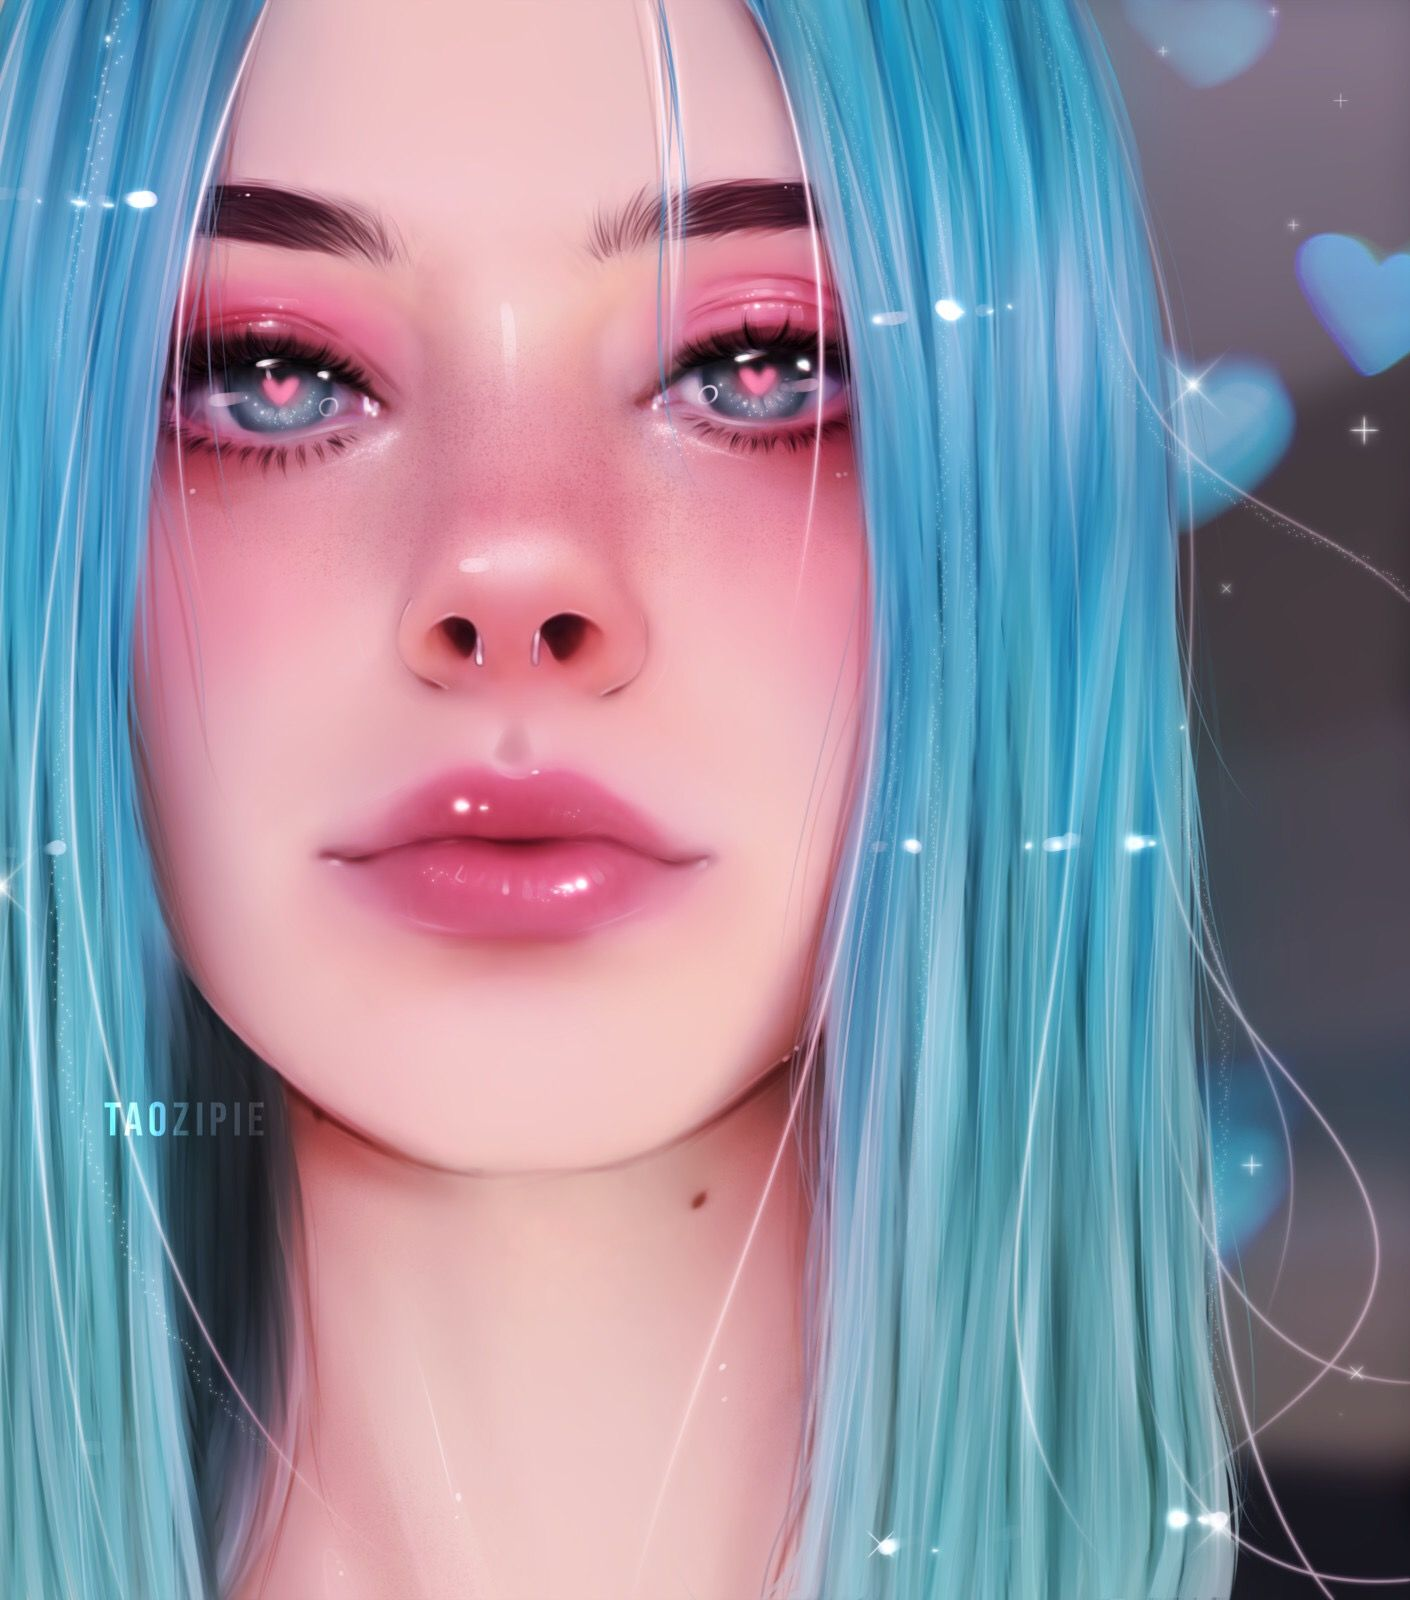 Love And Other Things Visualartzi Digital Art Romance Eyes Character Design Blue Hair Hearts Reali Digital Art Girl Digital Portrait Art Girls Cartoon Art